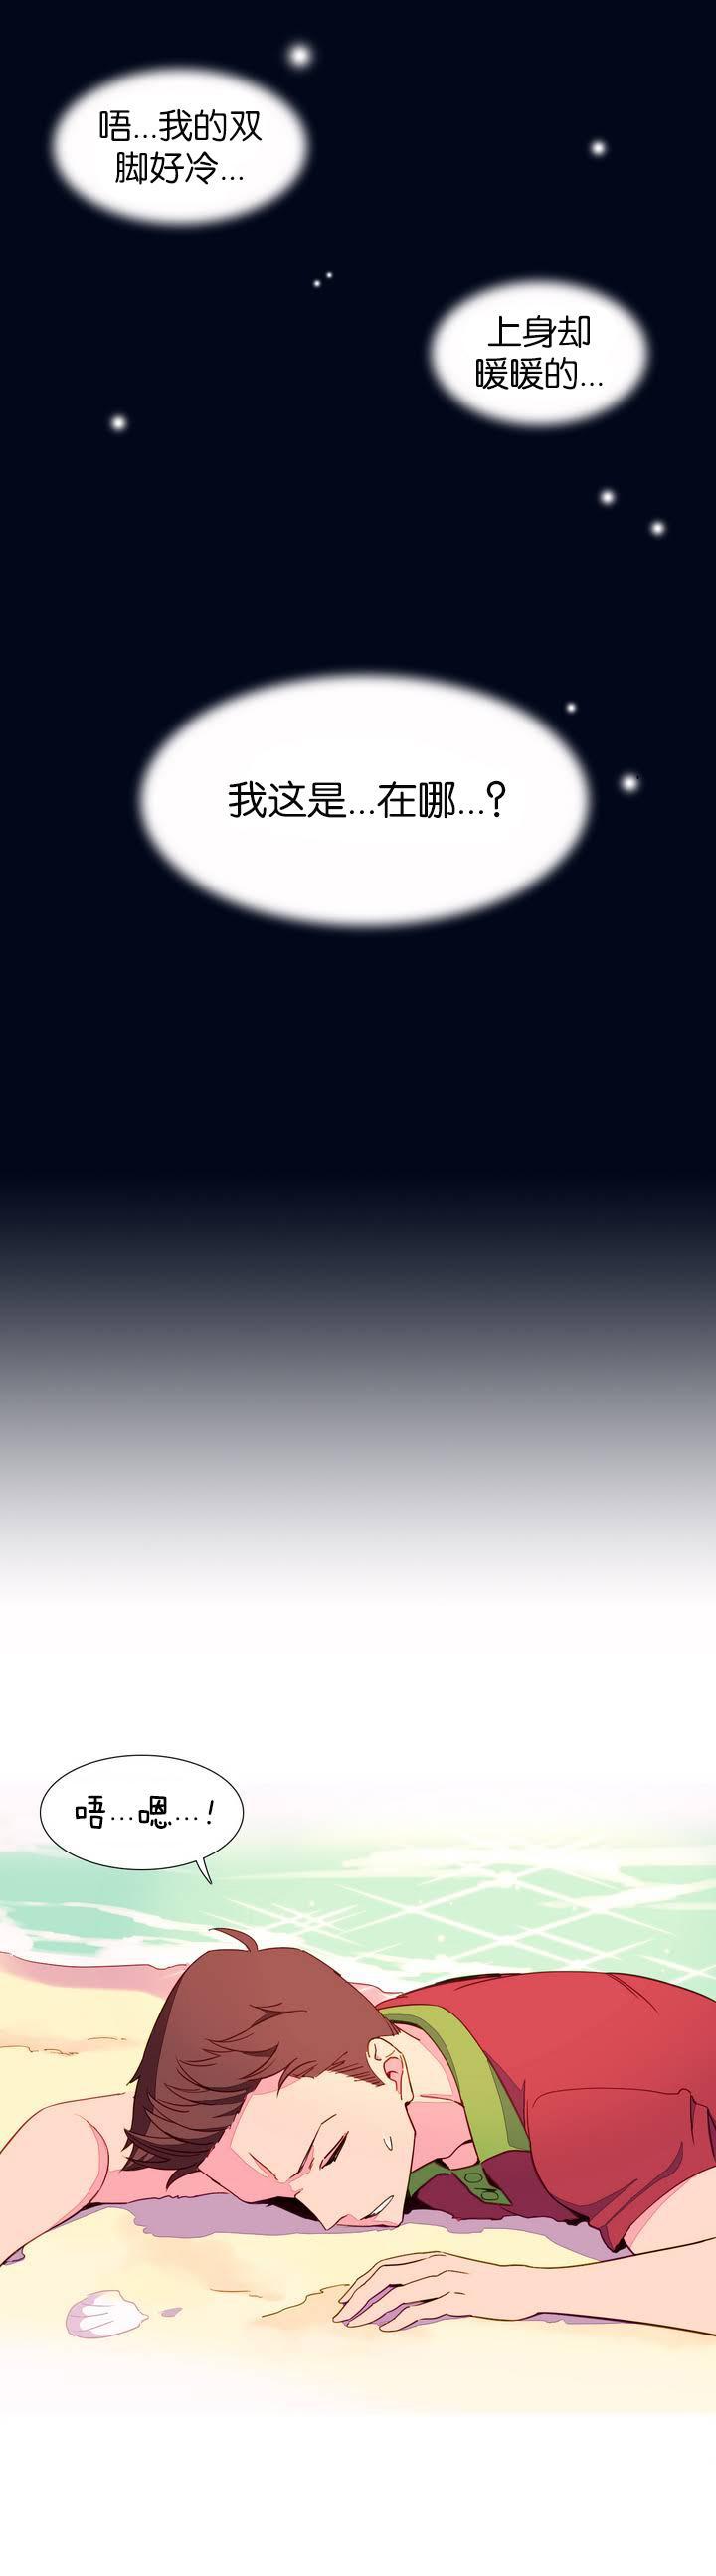 [Rozer] 一个由我统治的世界(A World that I Rule) Ch.1-3 [Chinese] 3